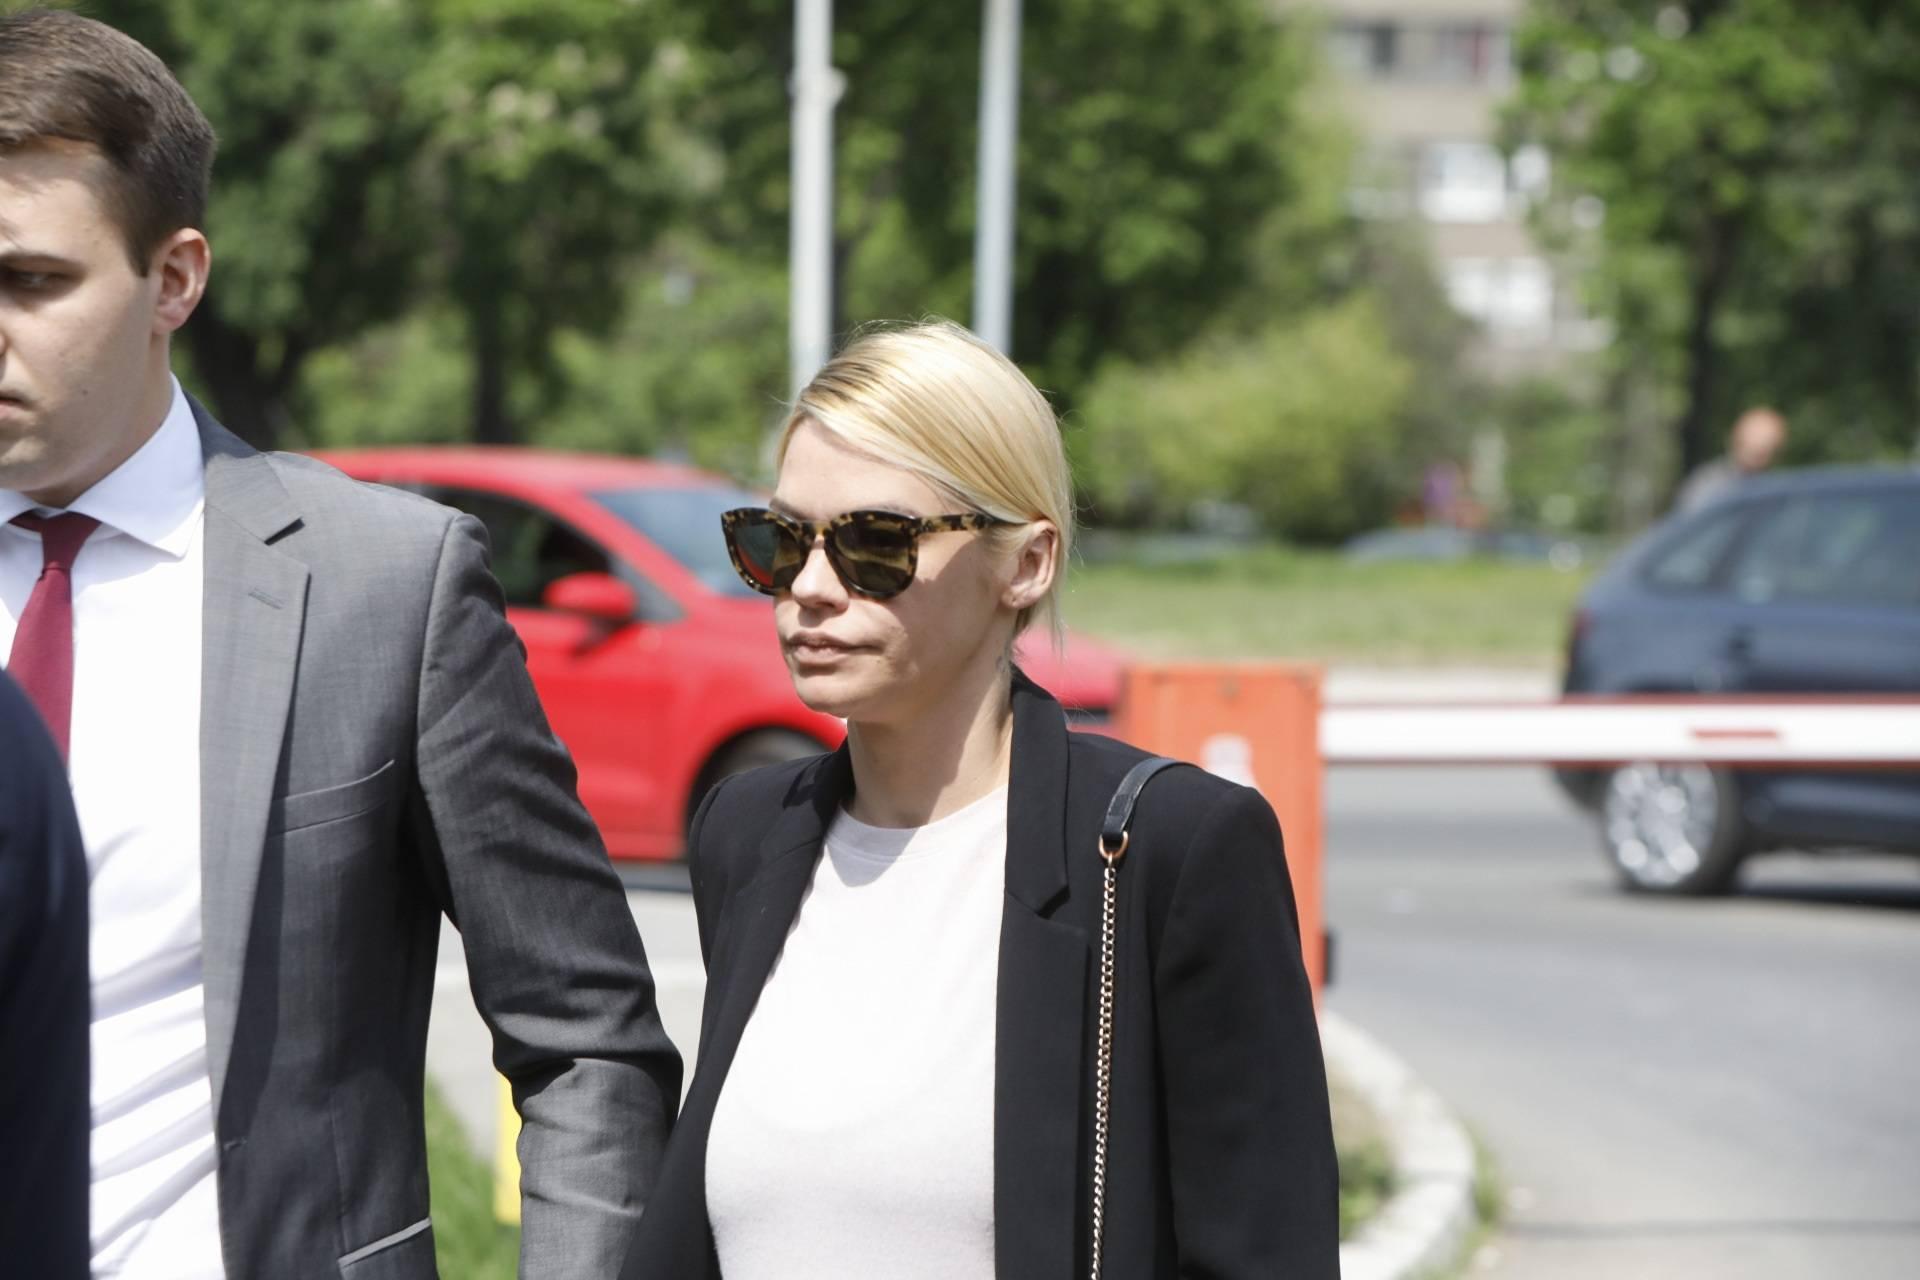 Bekvalac na sudu izbjegavala muža, a on se štitio od punca